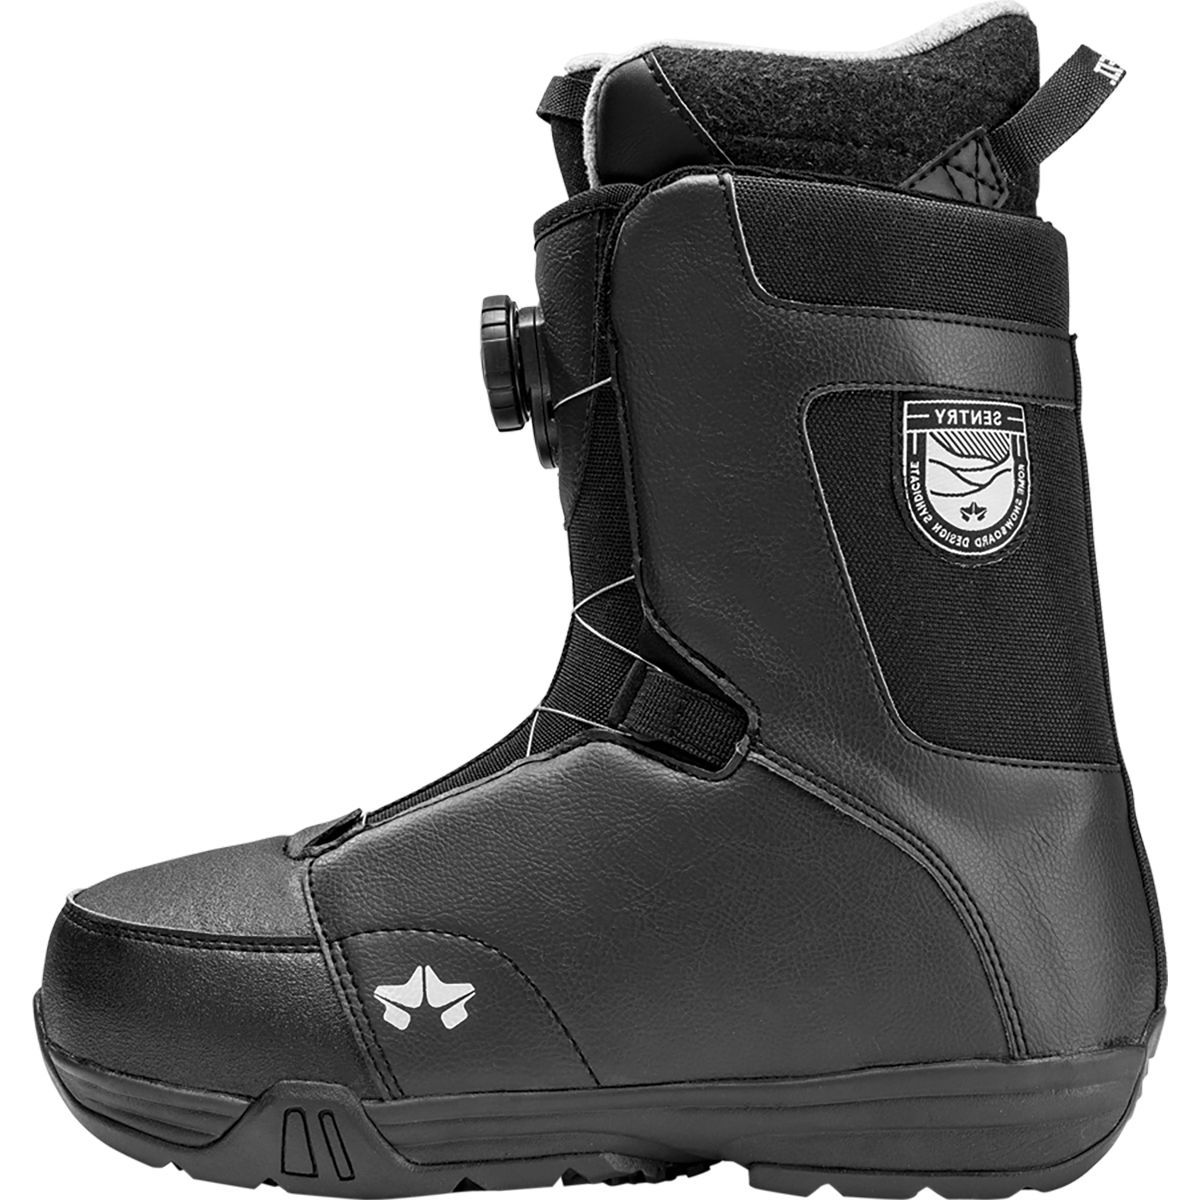 Rome Sentry Boa Snowboard Boot - Women's